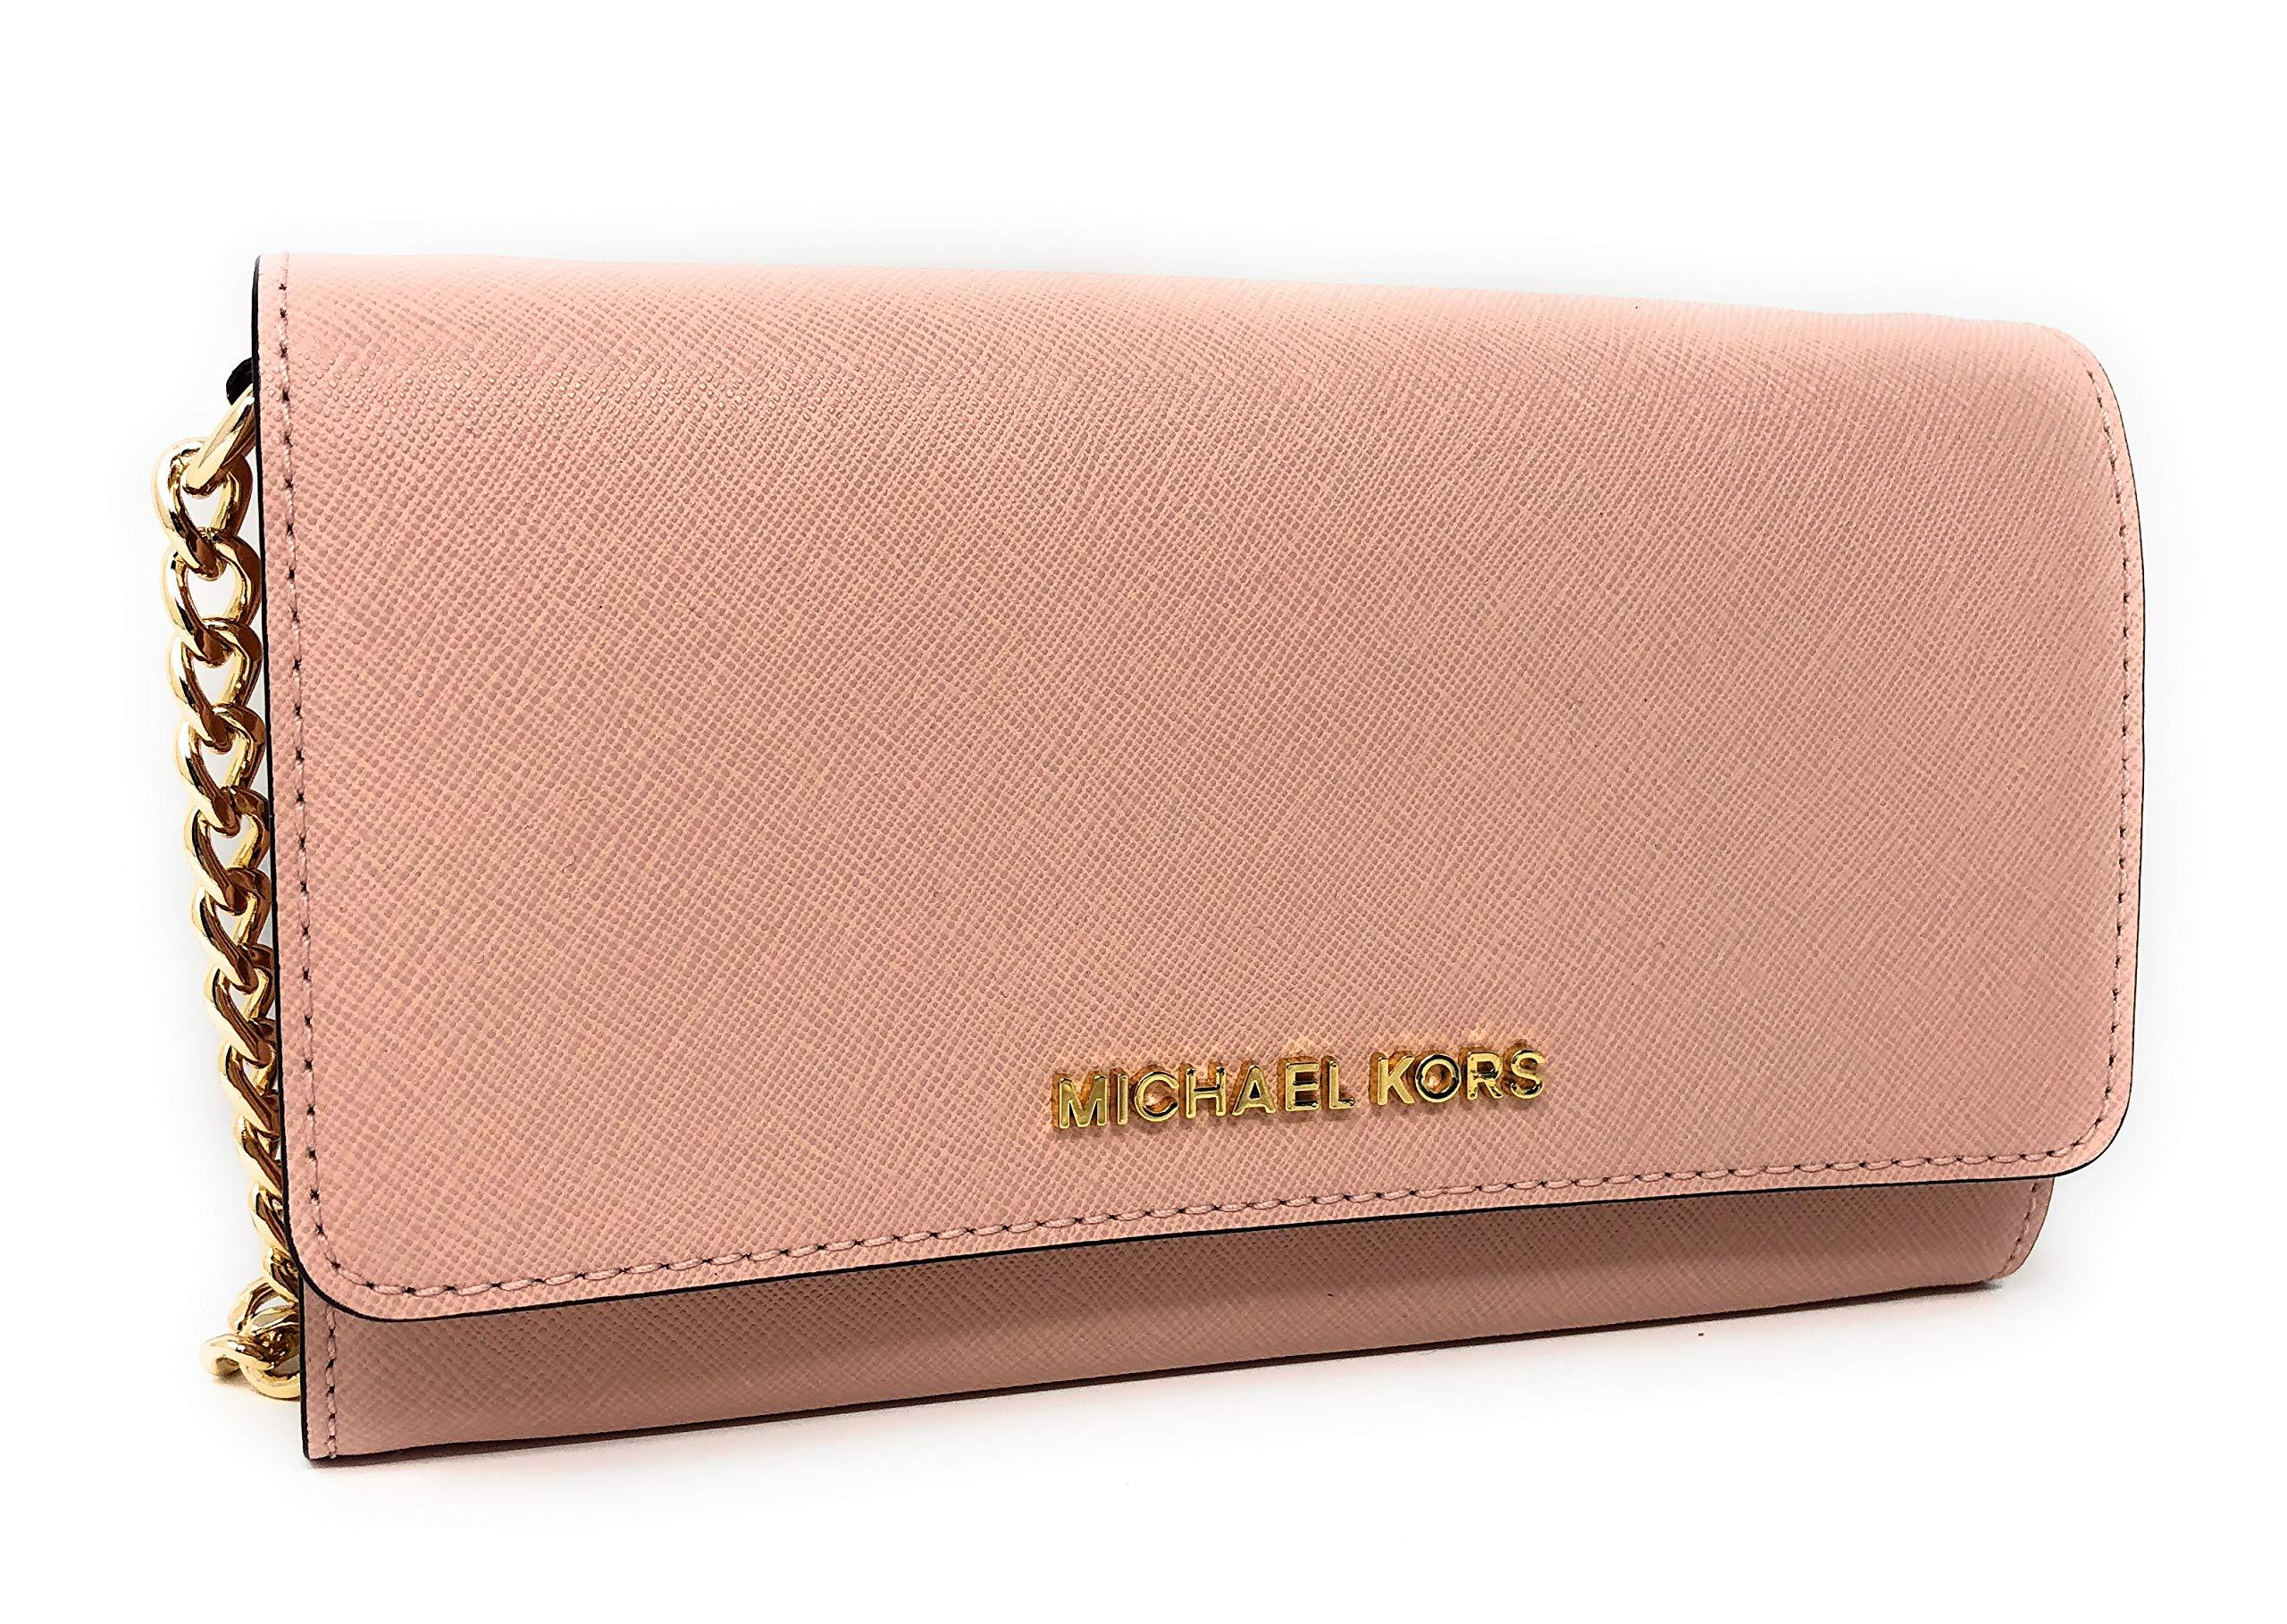 Michael Kors Jet Set Travel Large Leather Wallet Phone Crossbody Bag in Pastel Pink